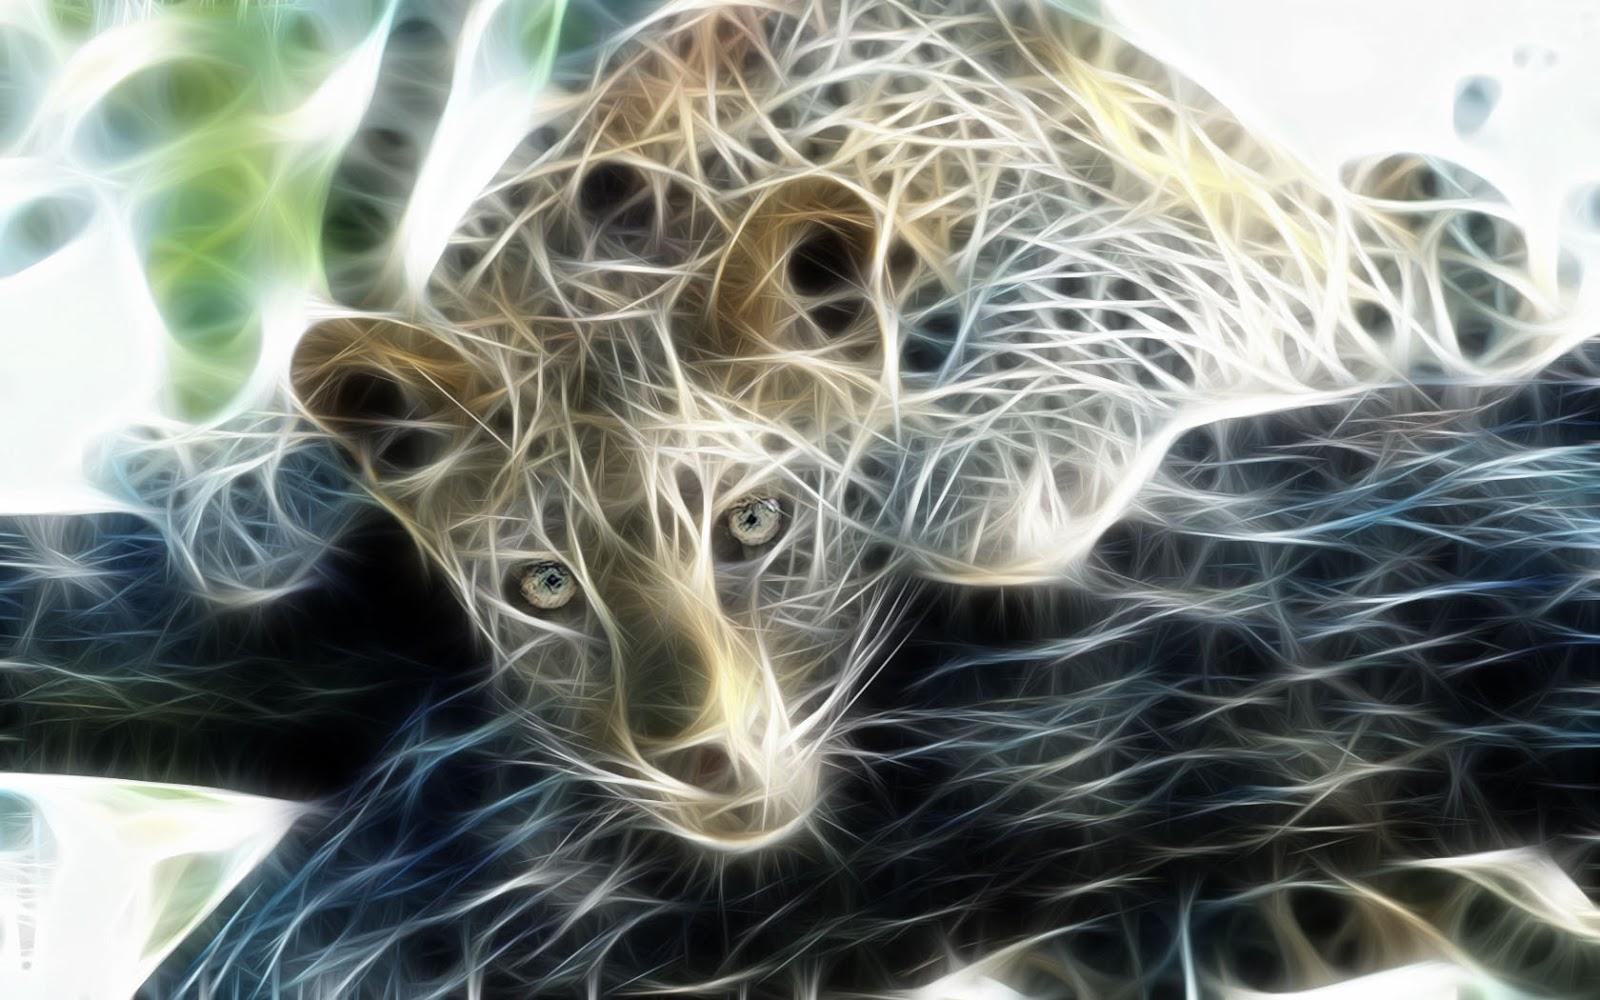 Wallpapers hd desktop wallpapers free online animal - 3d animal wallpaper ...